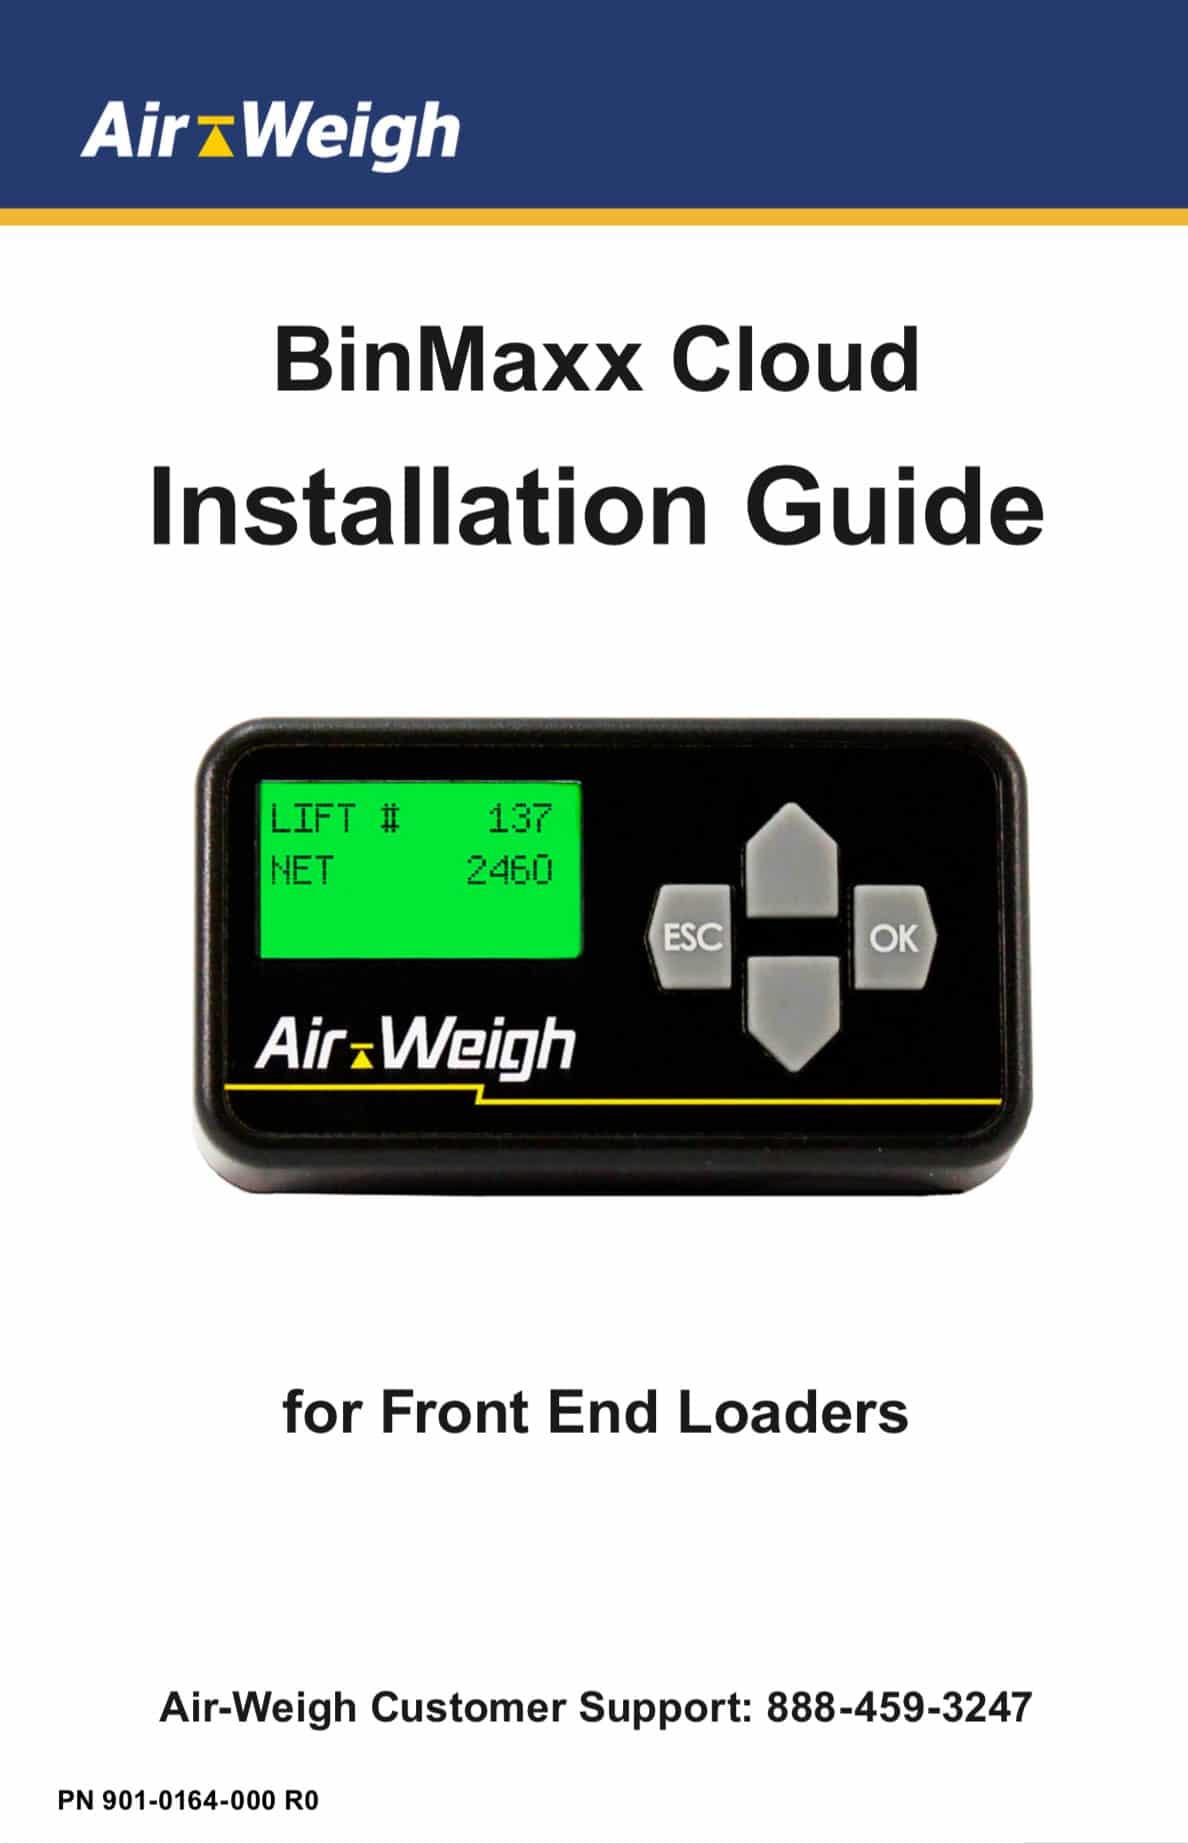 BinMaxx Cloud Installation Guide